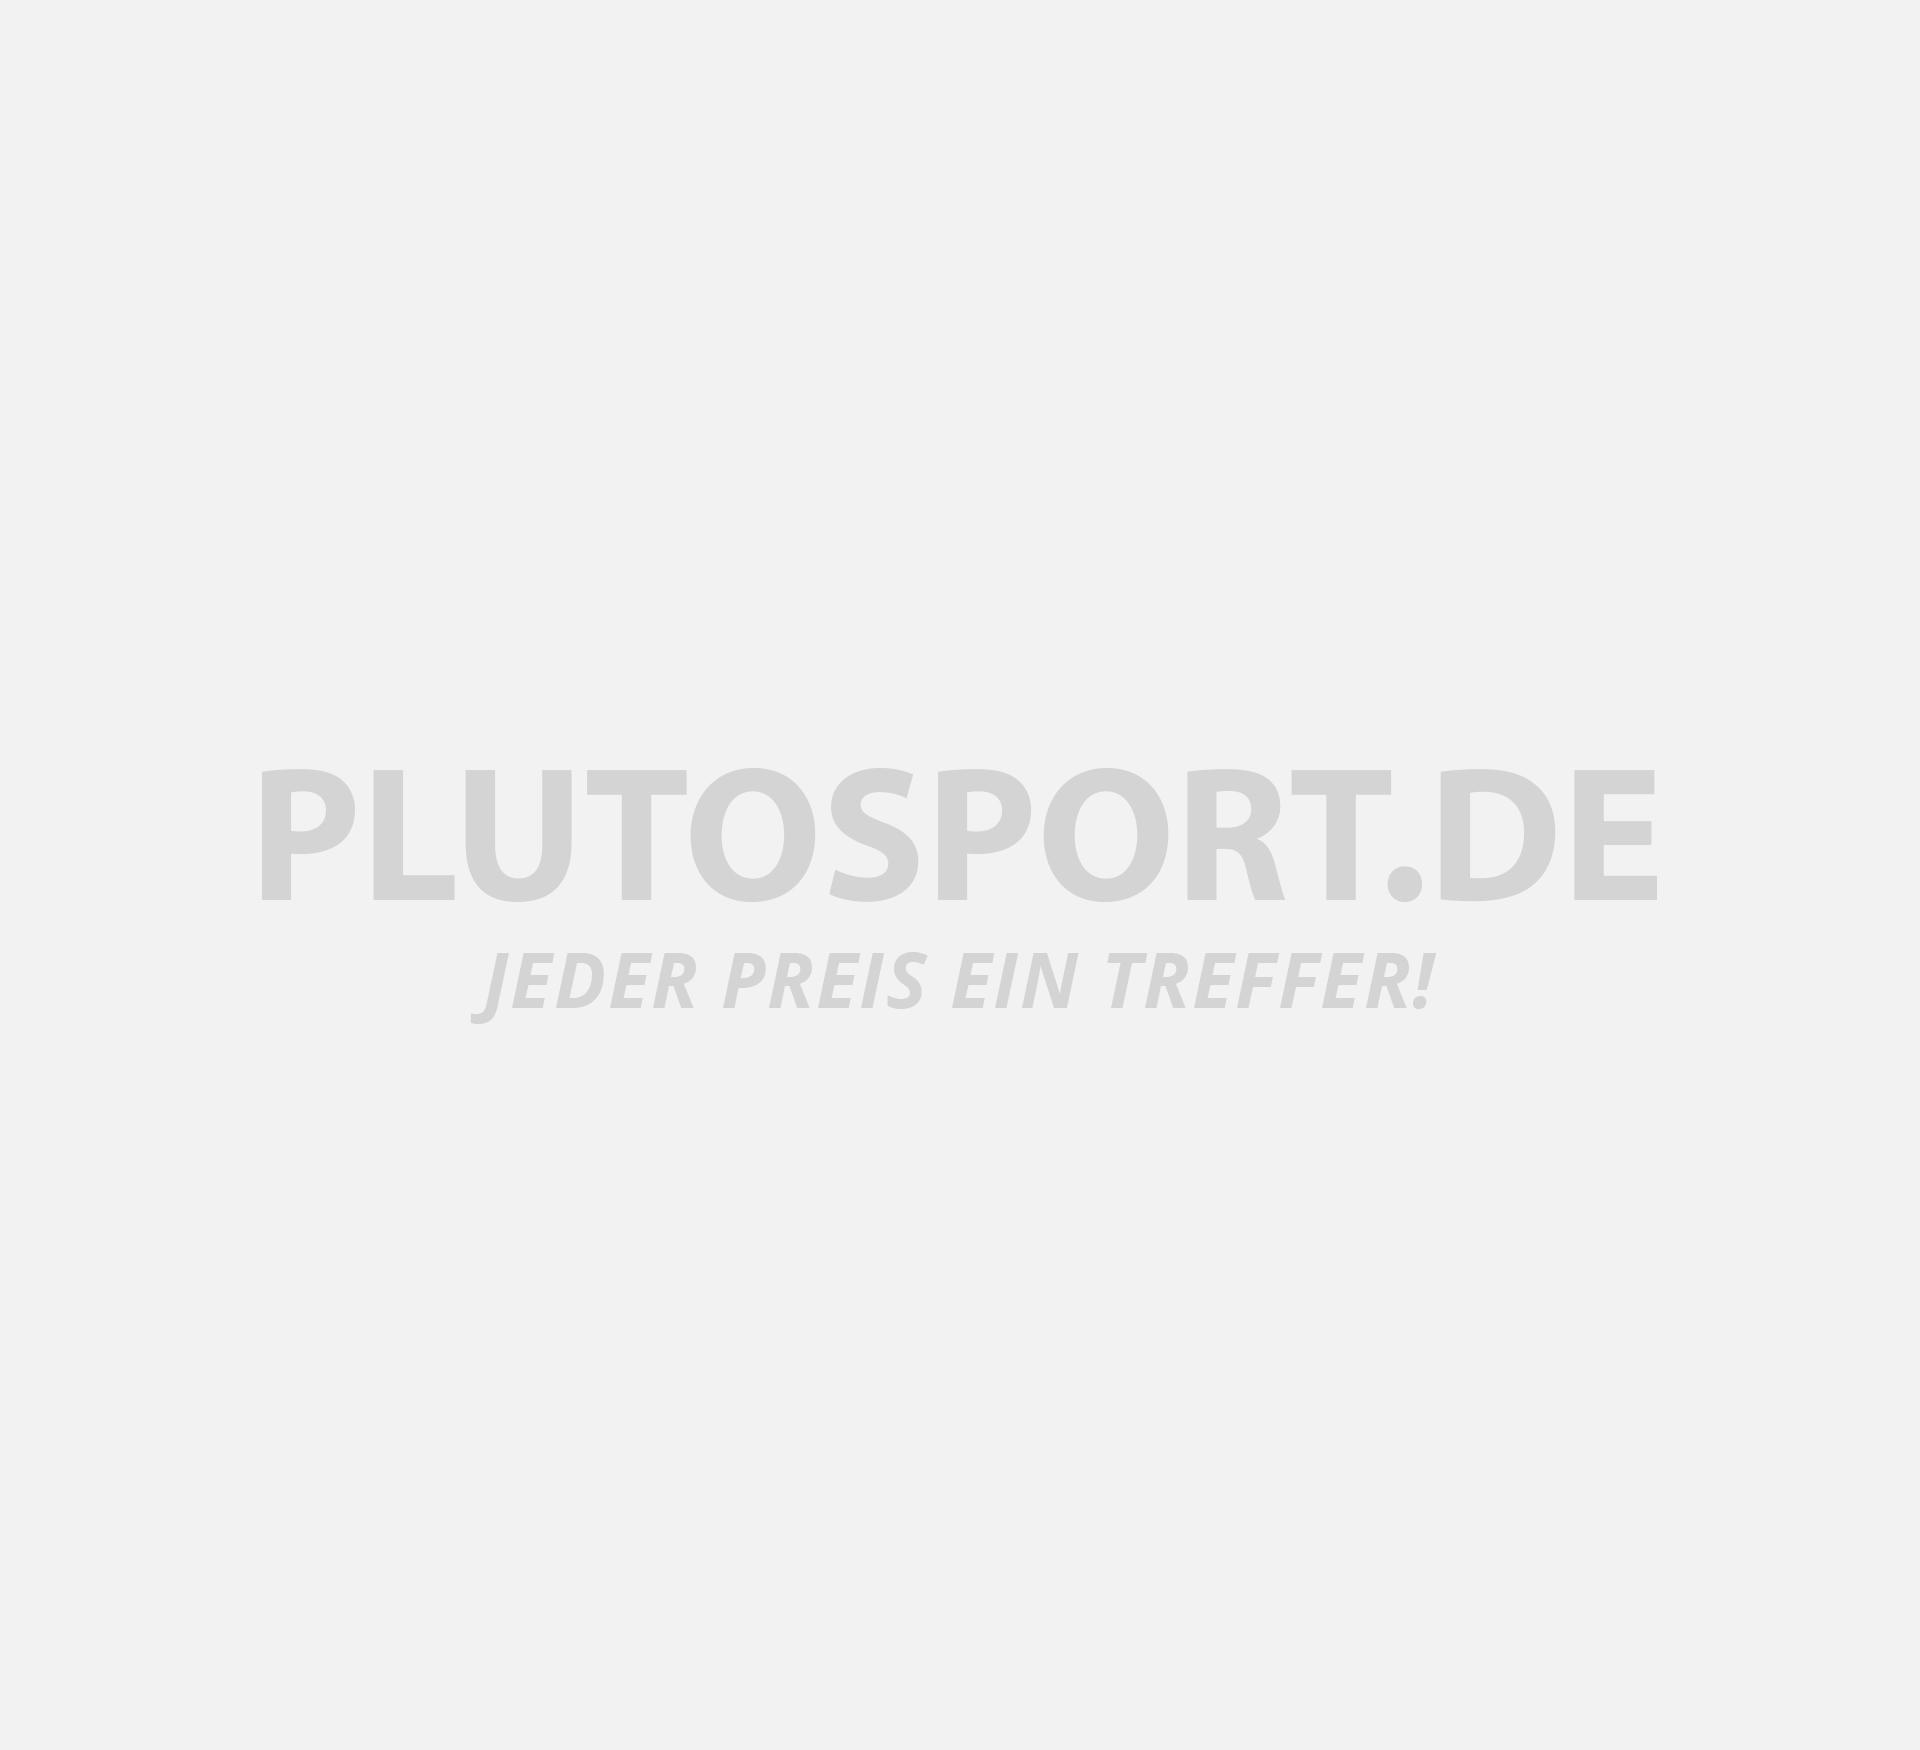 on sale 96f91 c8d4e Adidas Nitrocharge 3.0 TRX TF Fußballschuh für Kinder